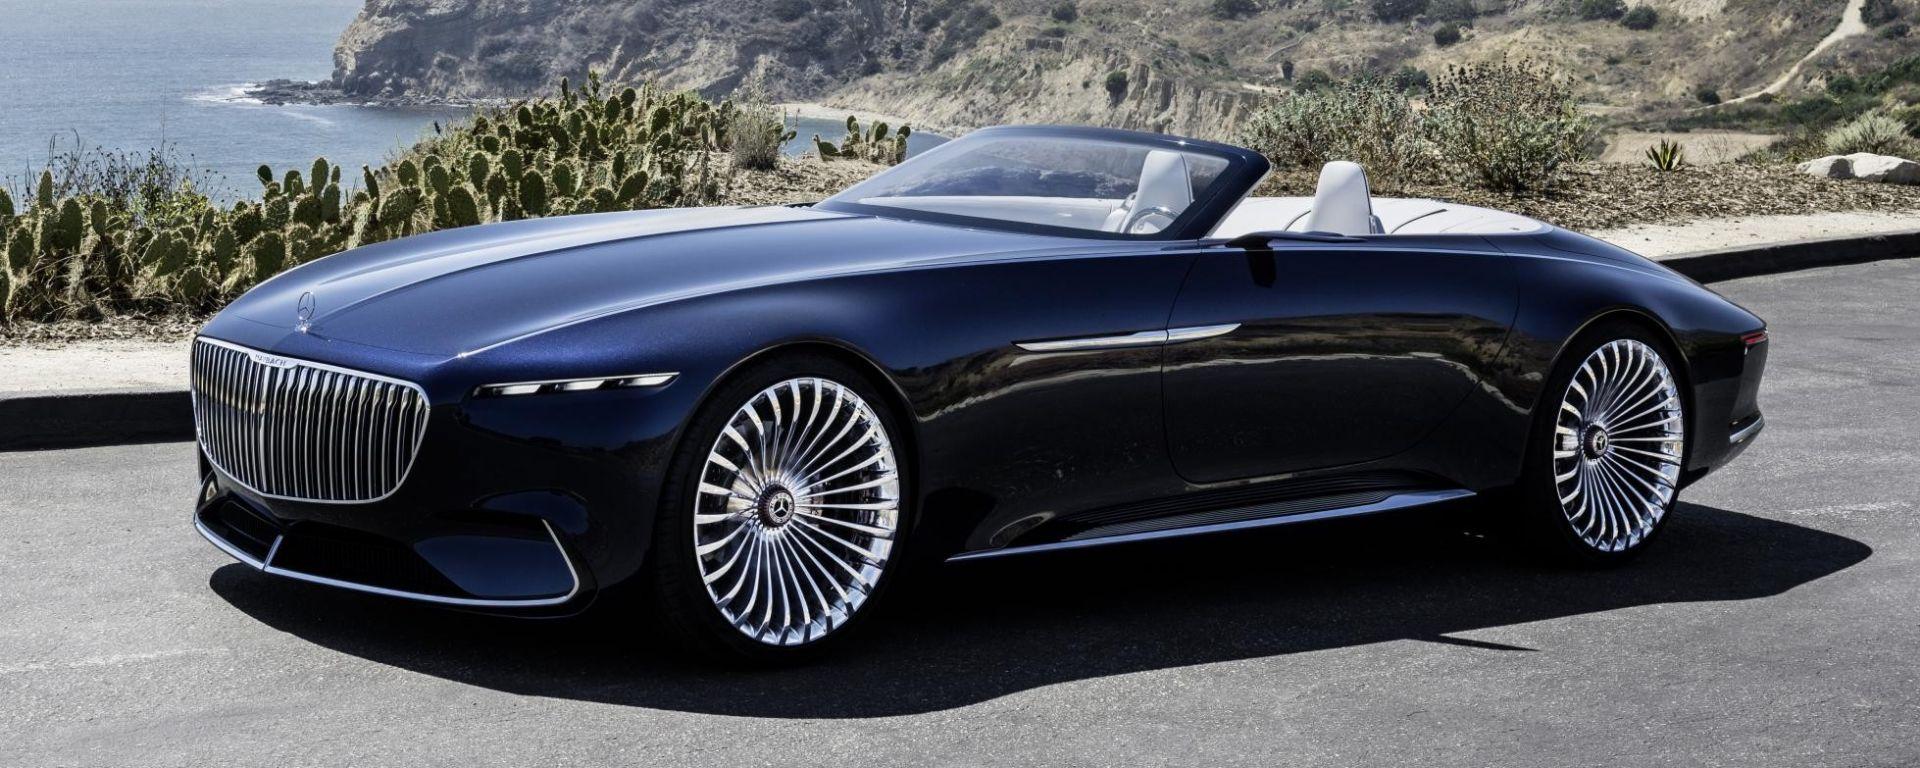 Mercedes-Maybach Vision 6 Cabriolet: concept col vento tra i capelli